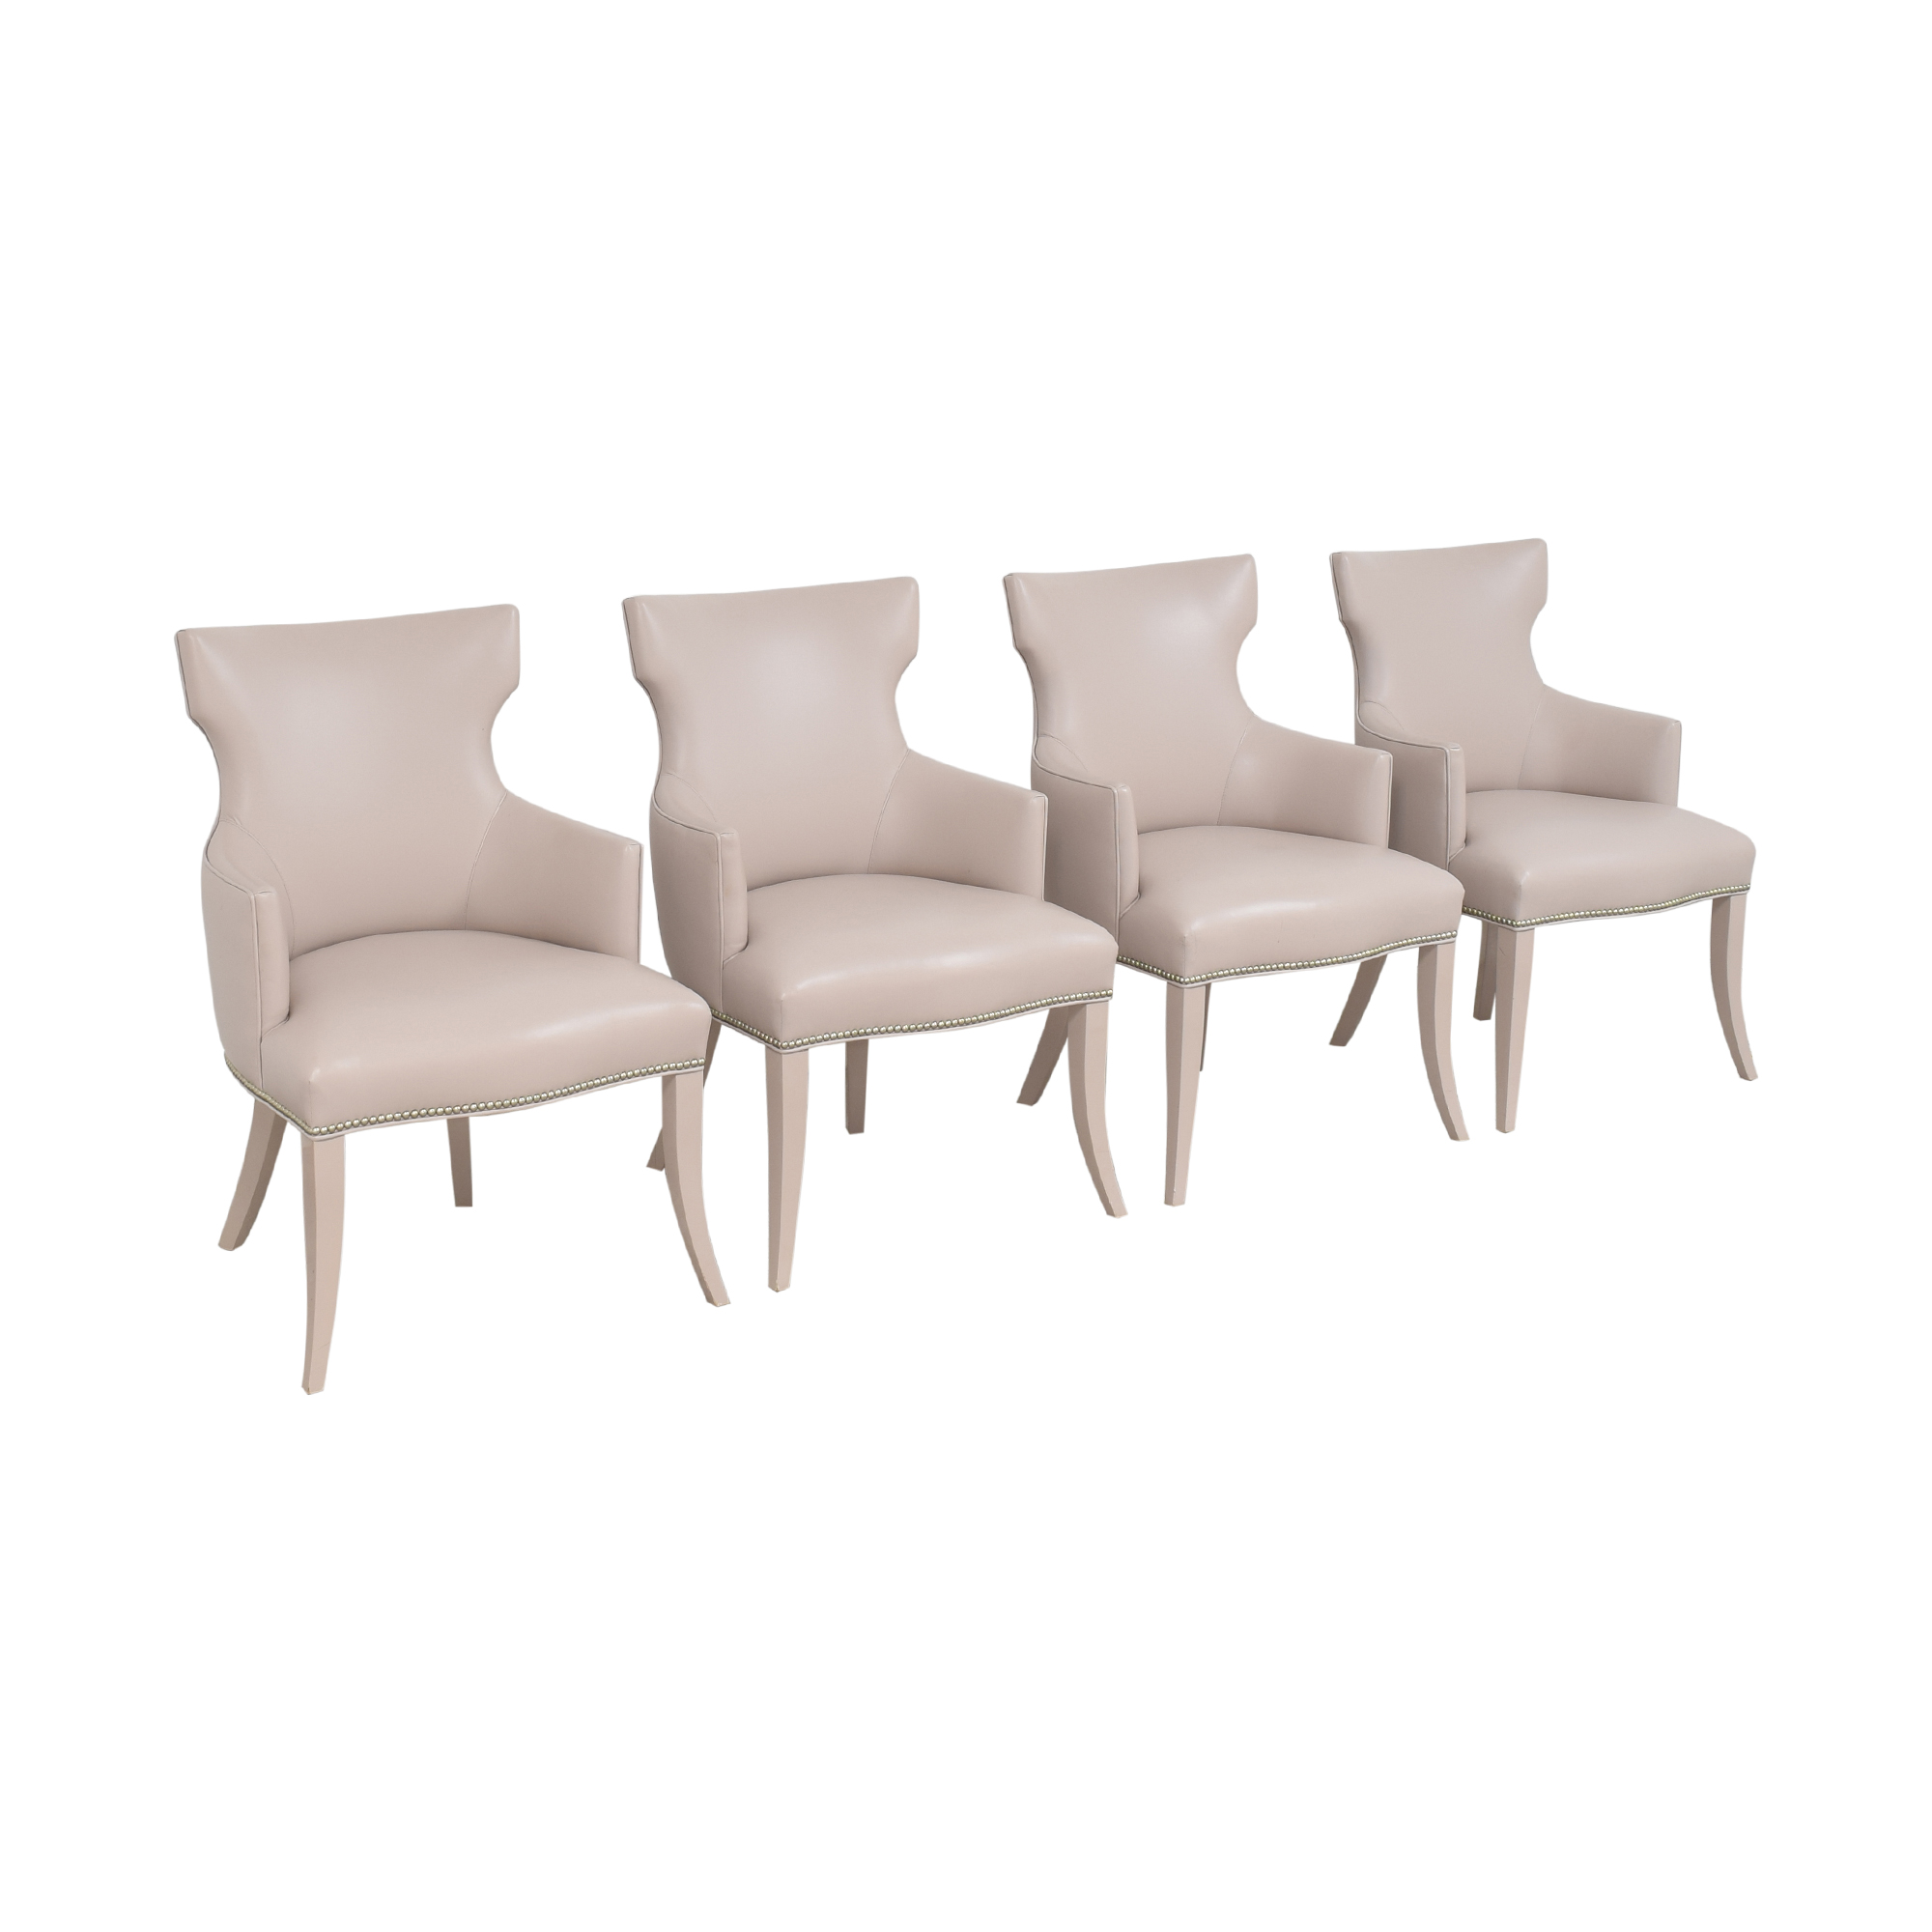 shop Artistic Frame Custom Wing Back Dining Chairs Artistic Frame Chairs